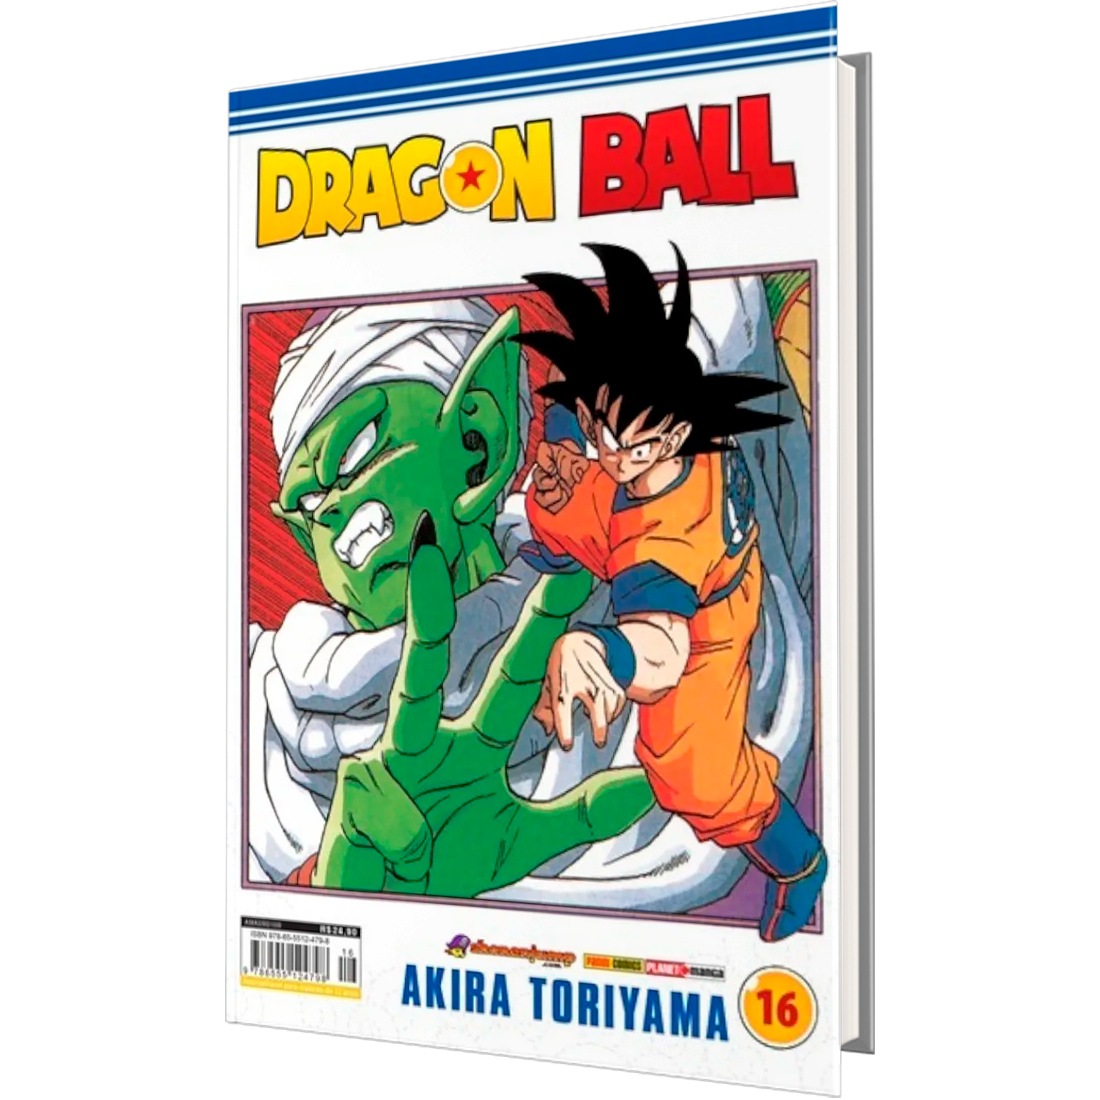 Dragon Ball Vol. 16